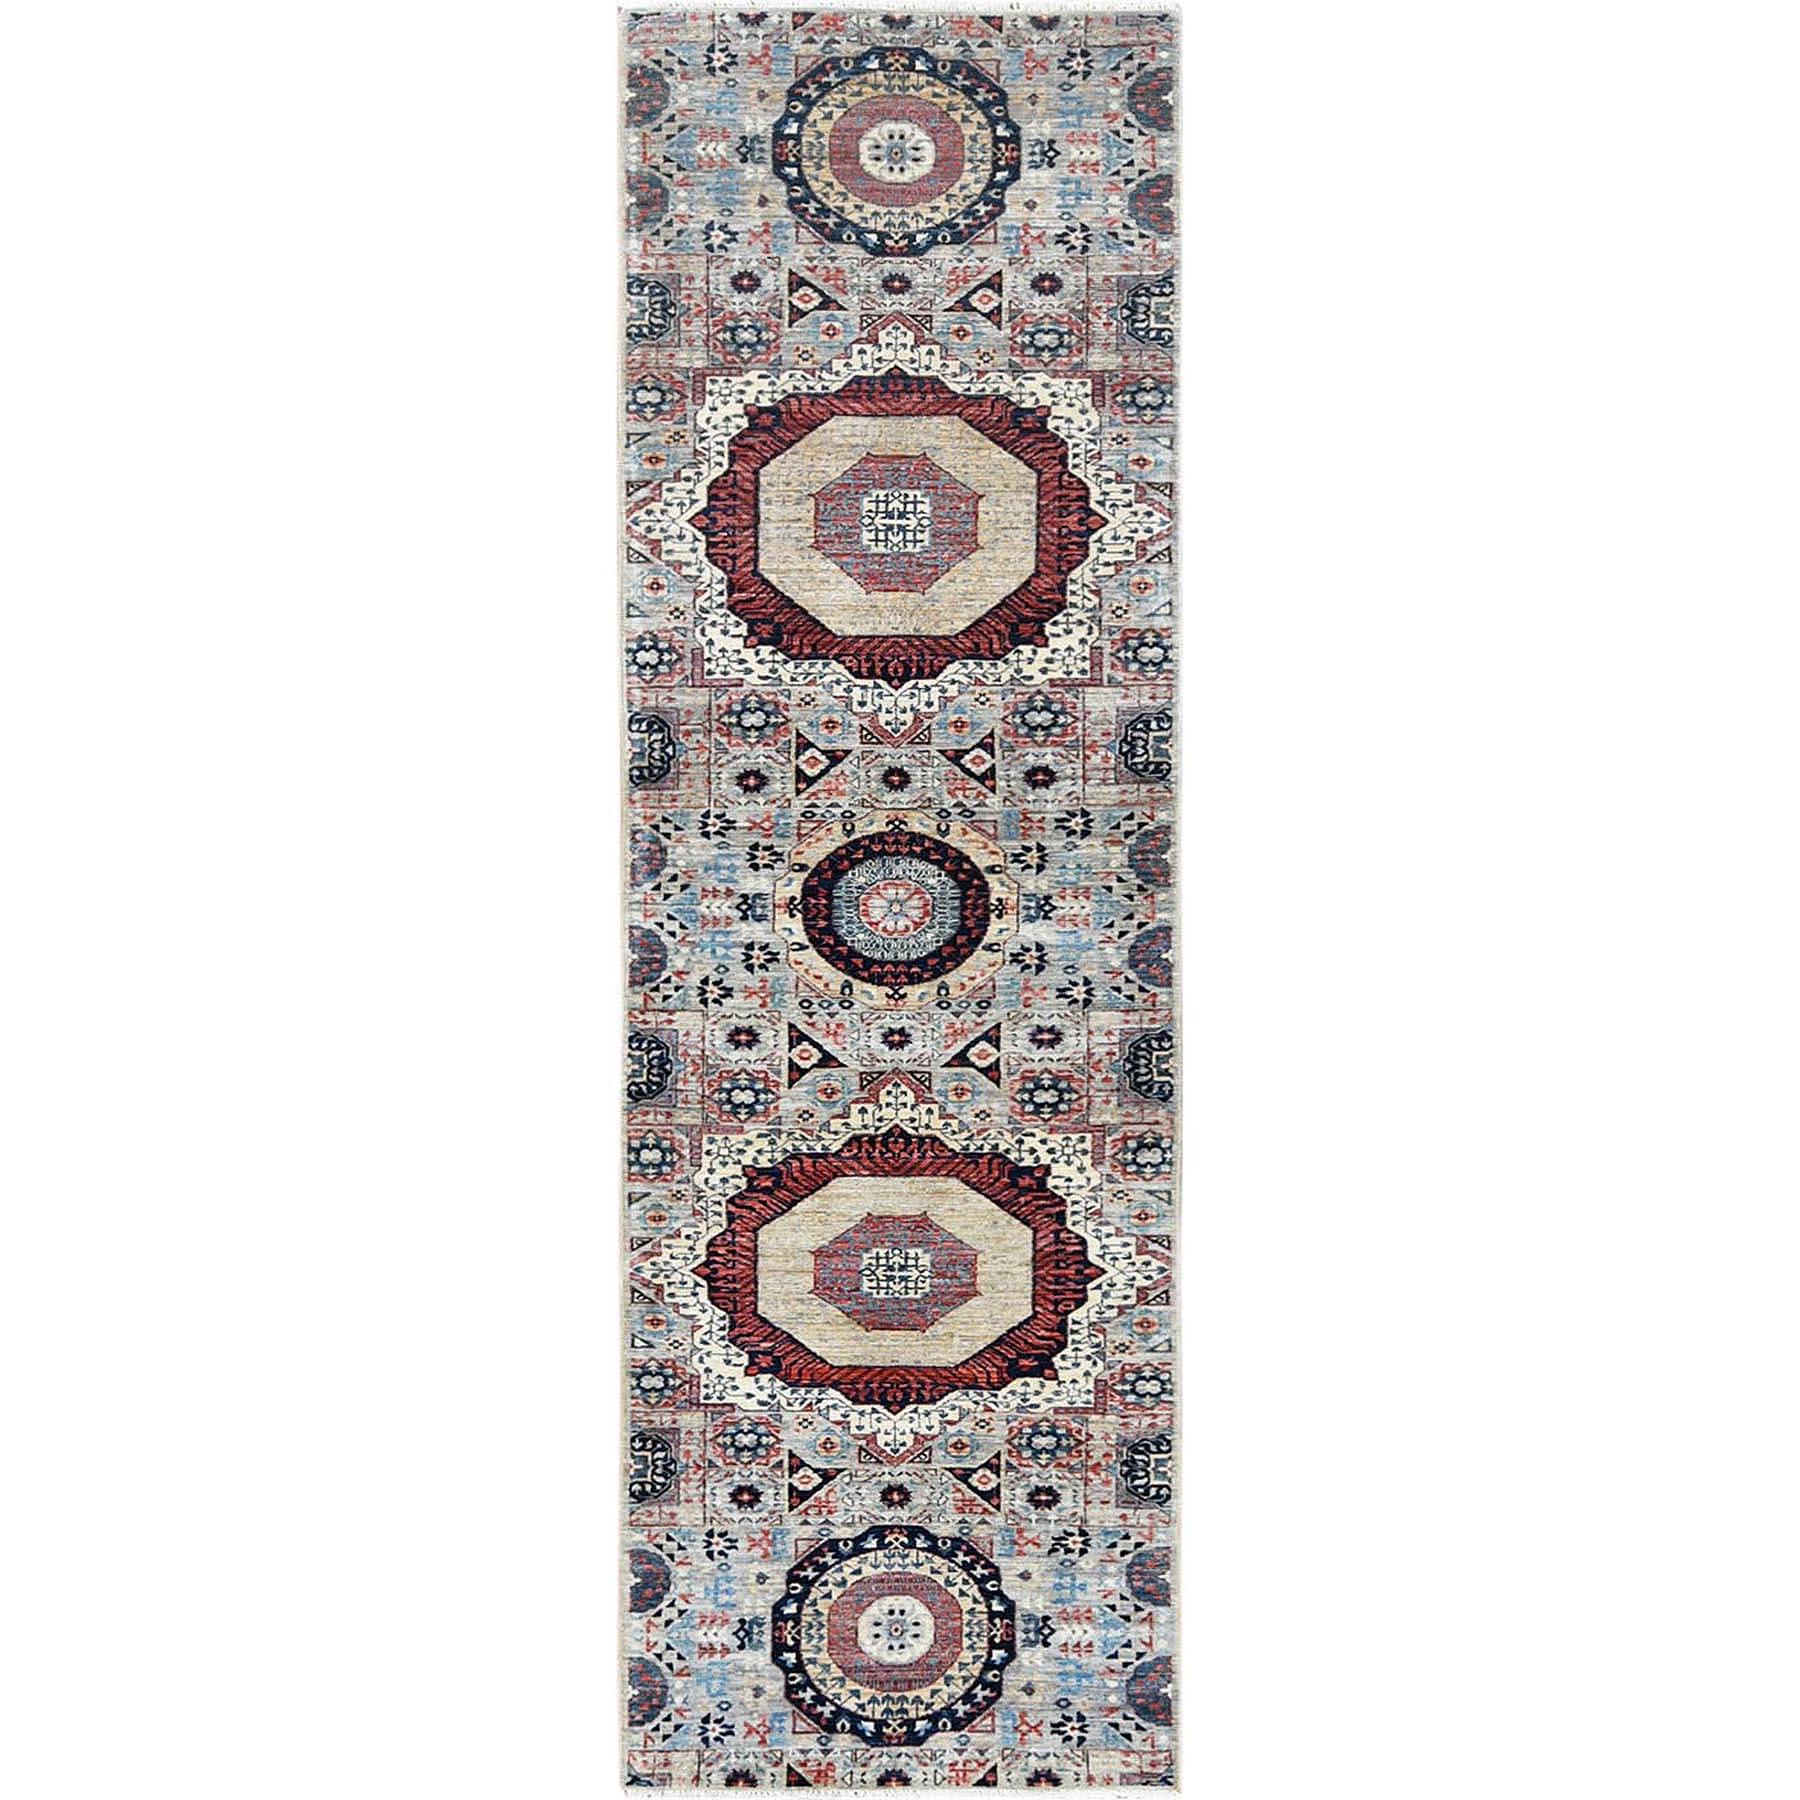 "2'5""X9'7"" Gray Super Fine Peshawar Mamluk Design With Denser Weave Shiny Wool Even Pile Hand Knotted Runner Oriental Rug moa60b8e"